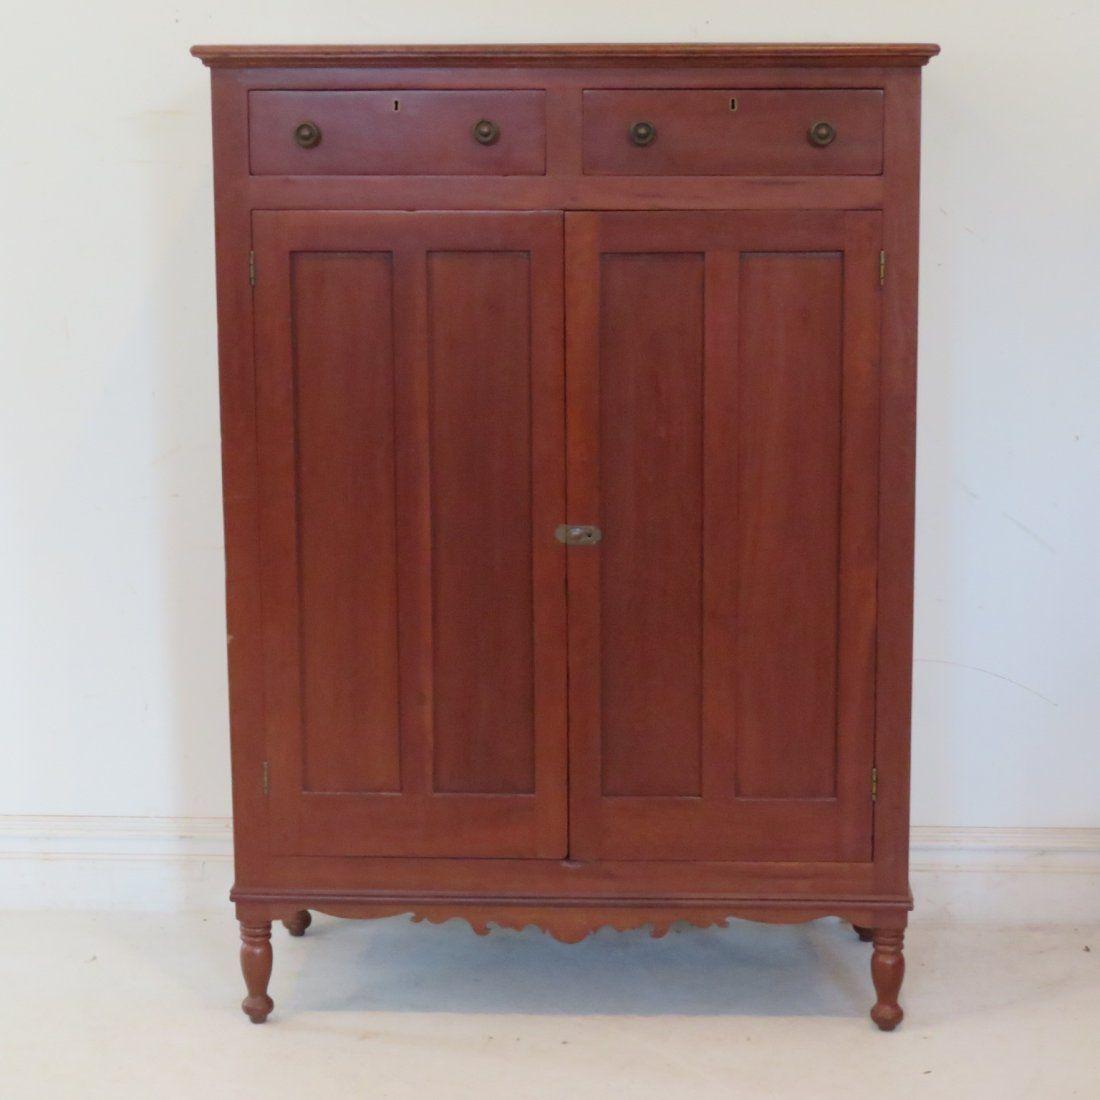 Cherry & poplar jelly cupboard with 2 drawers